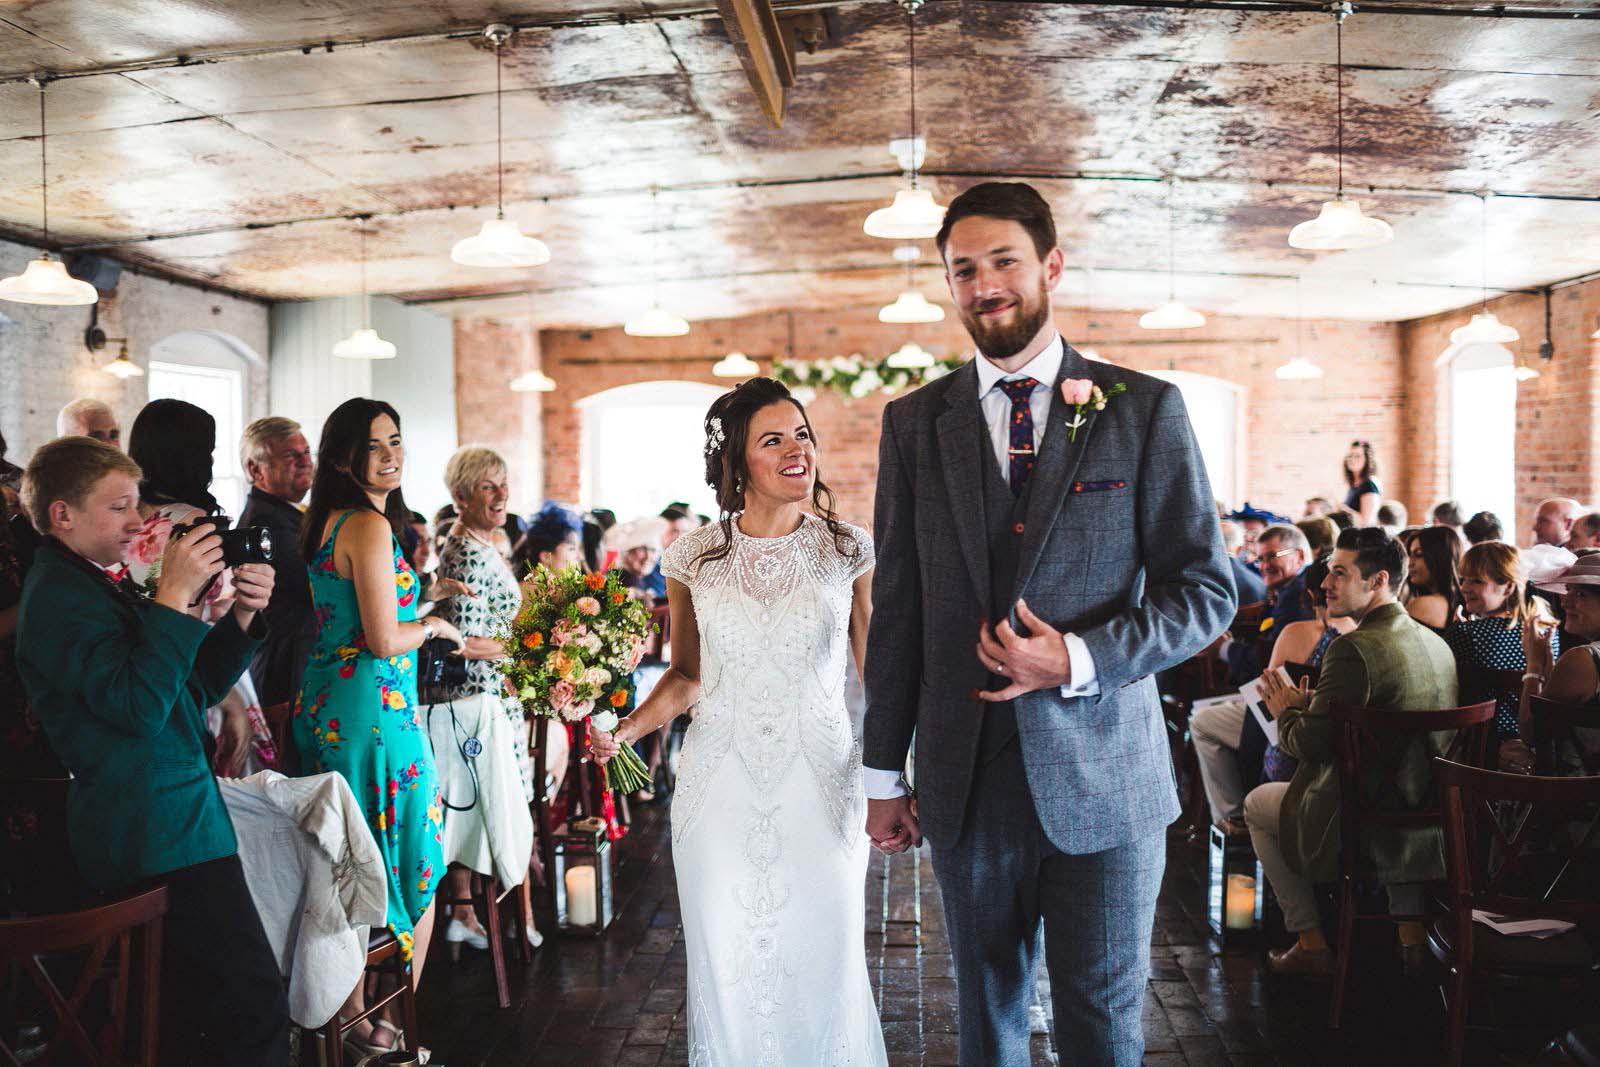 Kat and Chris wedding